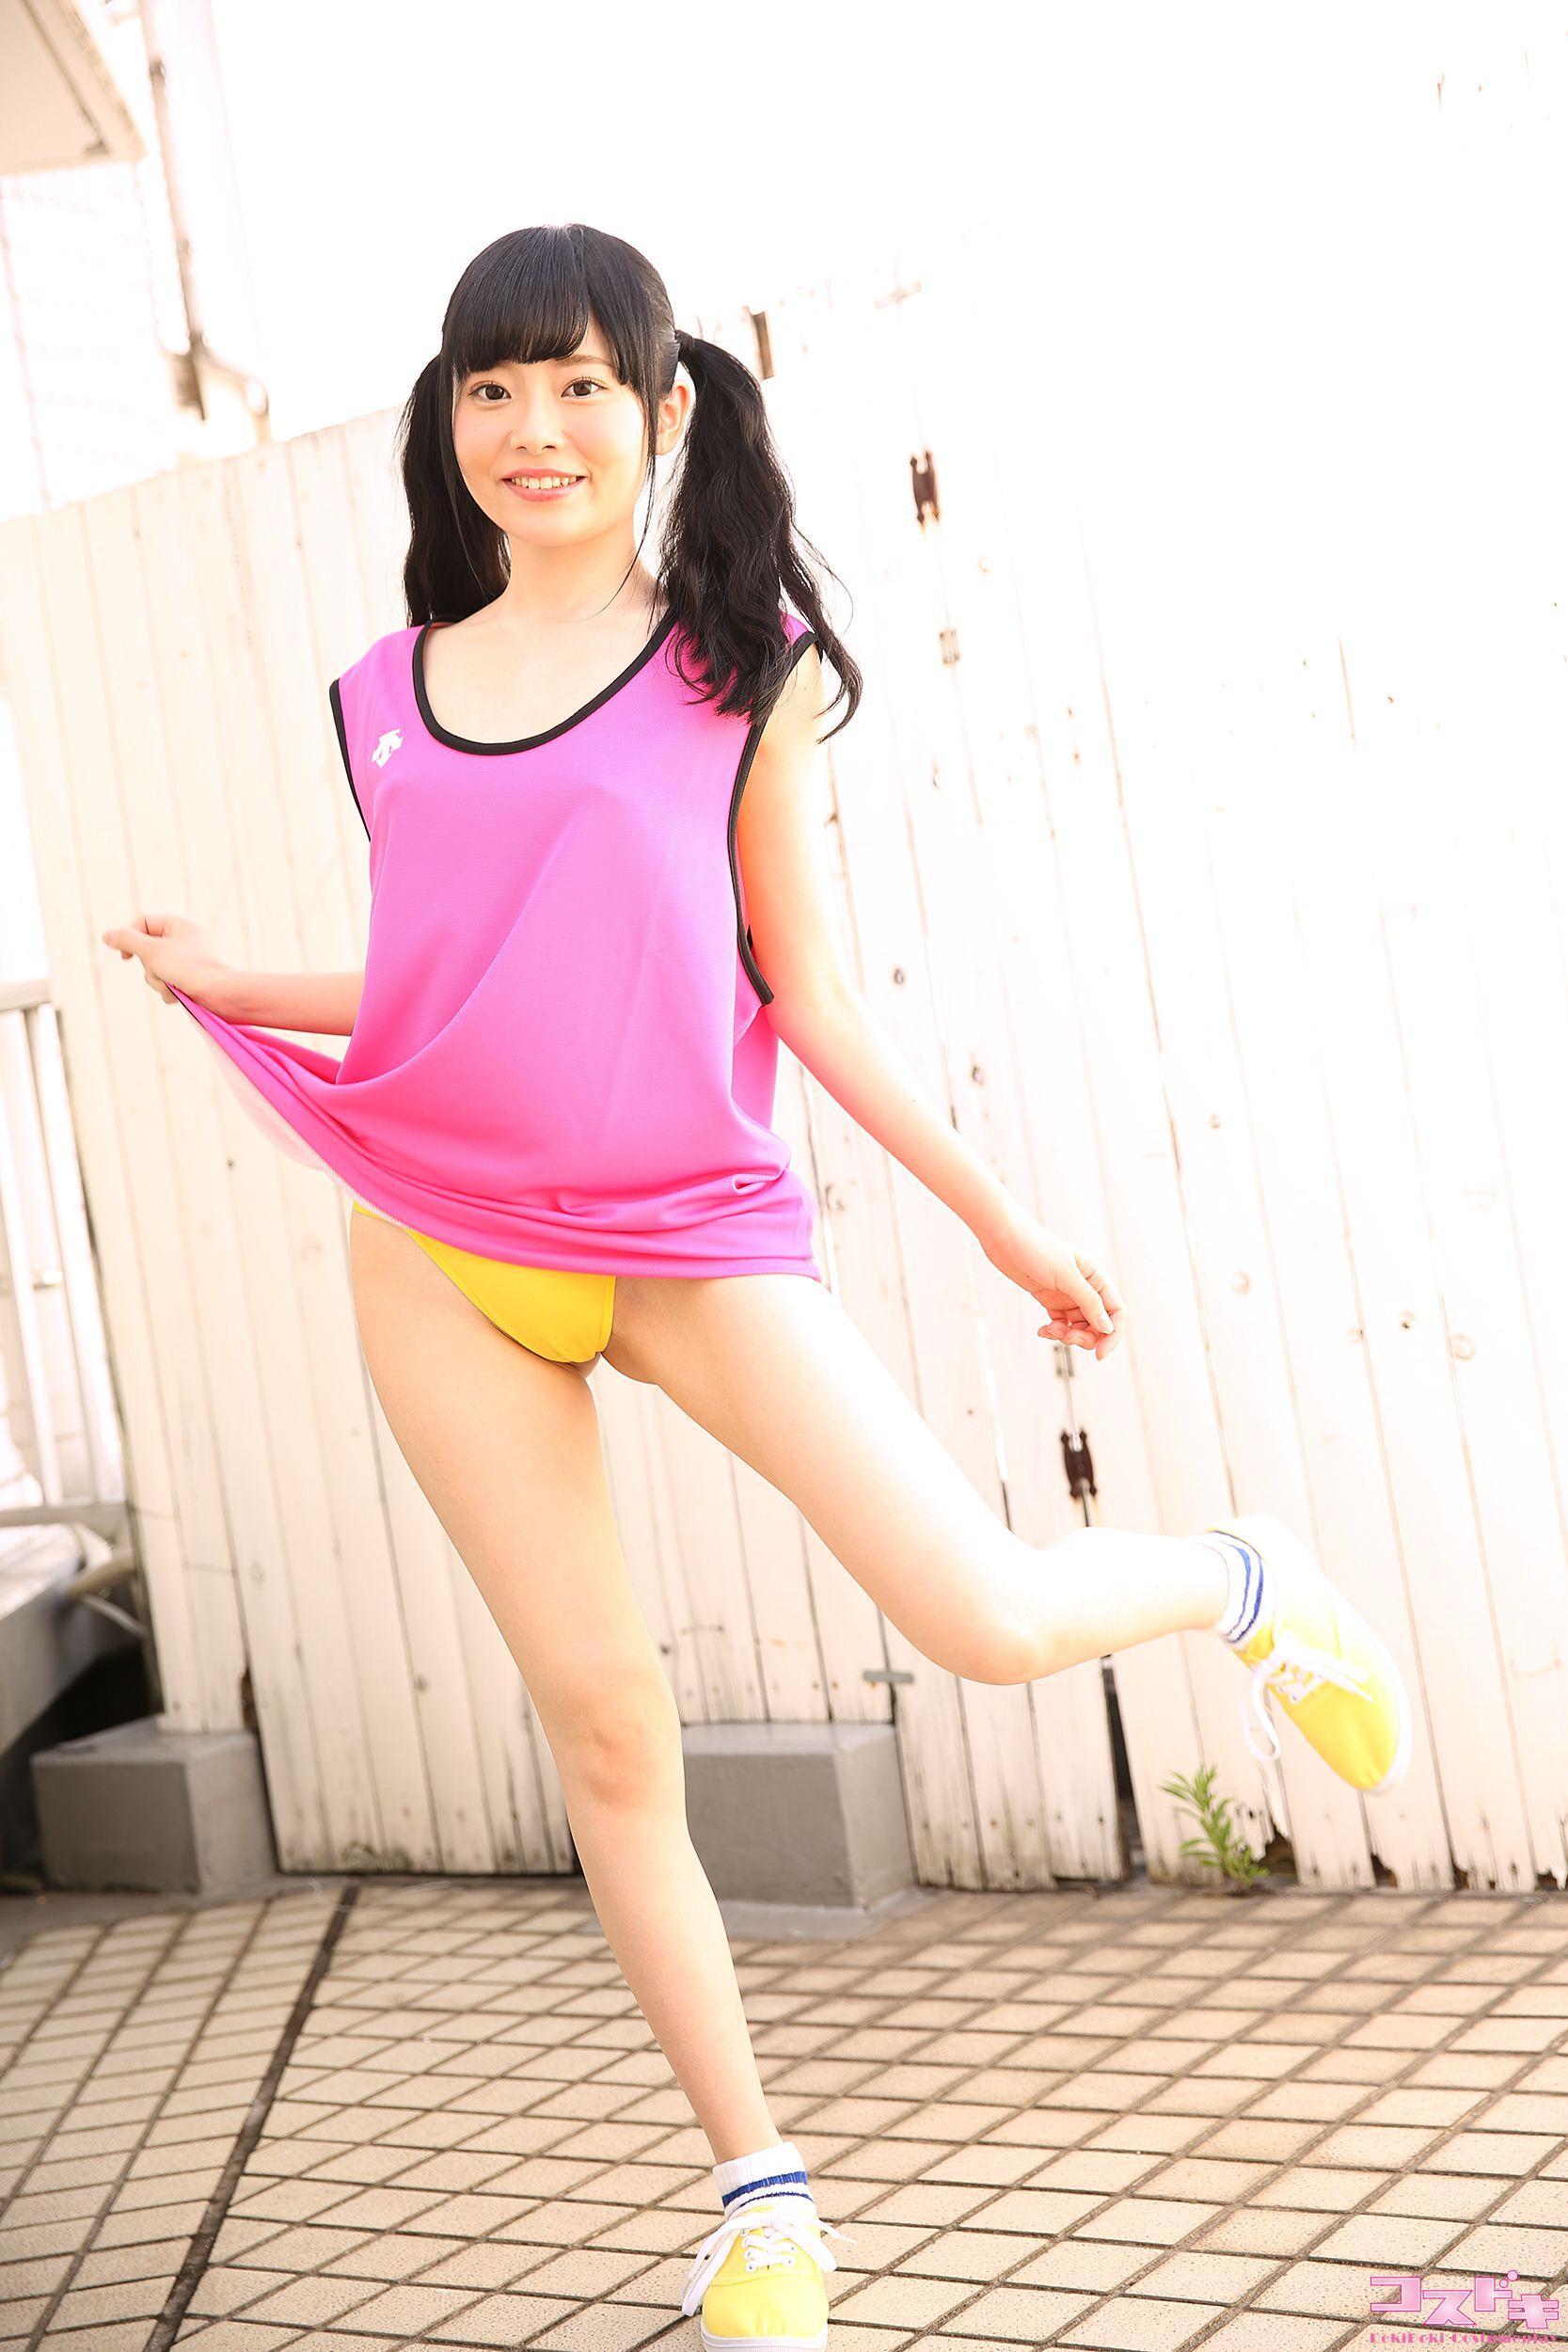 [Cosdoki]西野たえ(胡桃多惠,胡桃たえ)超高清写真大图片(45P)|738热度